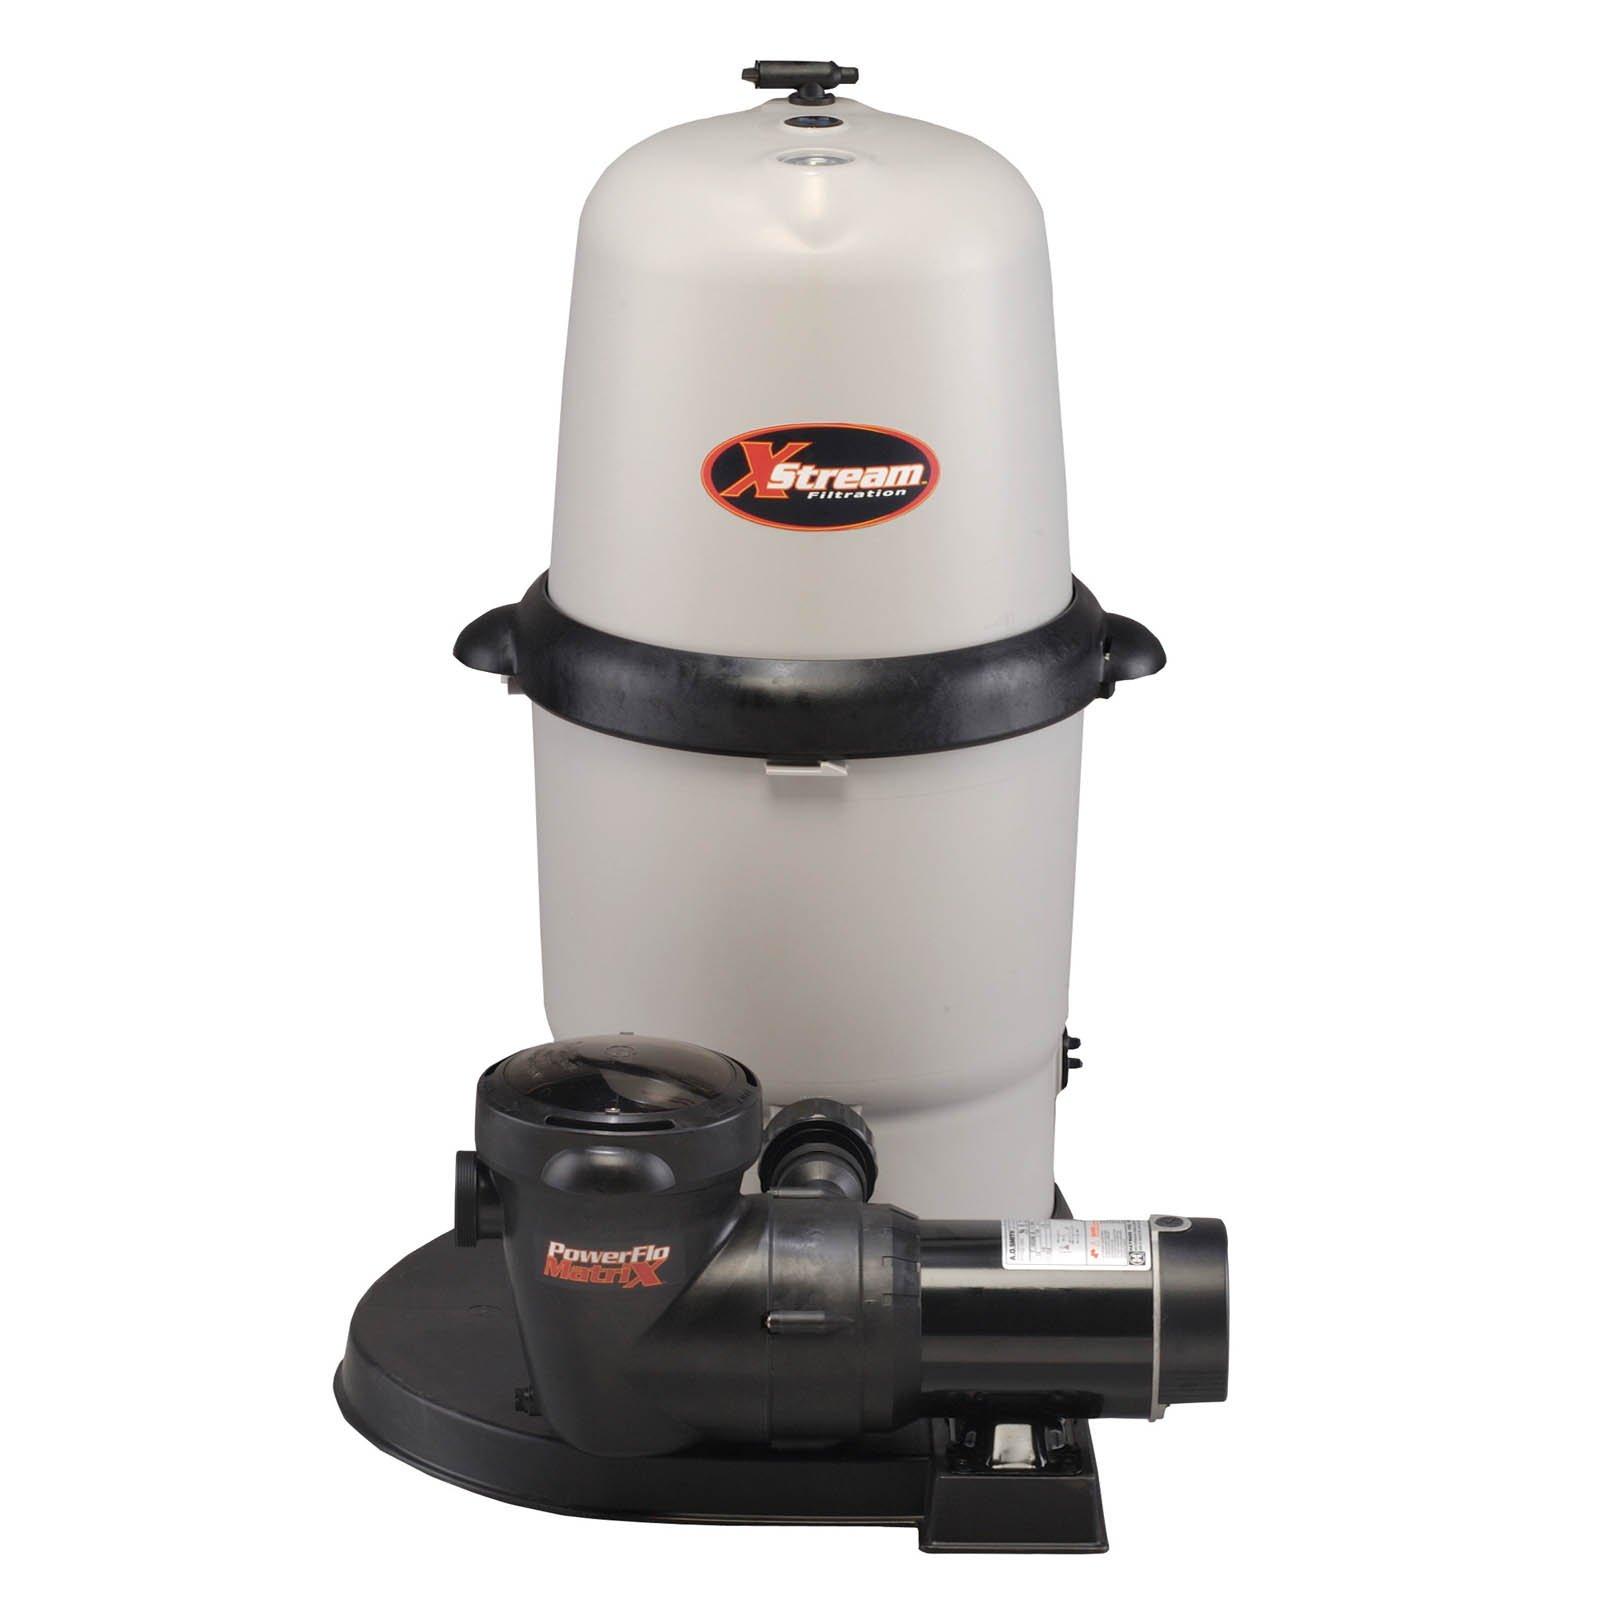 Hayward CC15093S Xstream Full-Flo 150-Square-Foot 1.5 Horsepower Filtration Filter